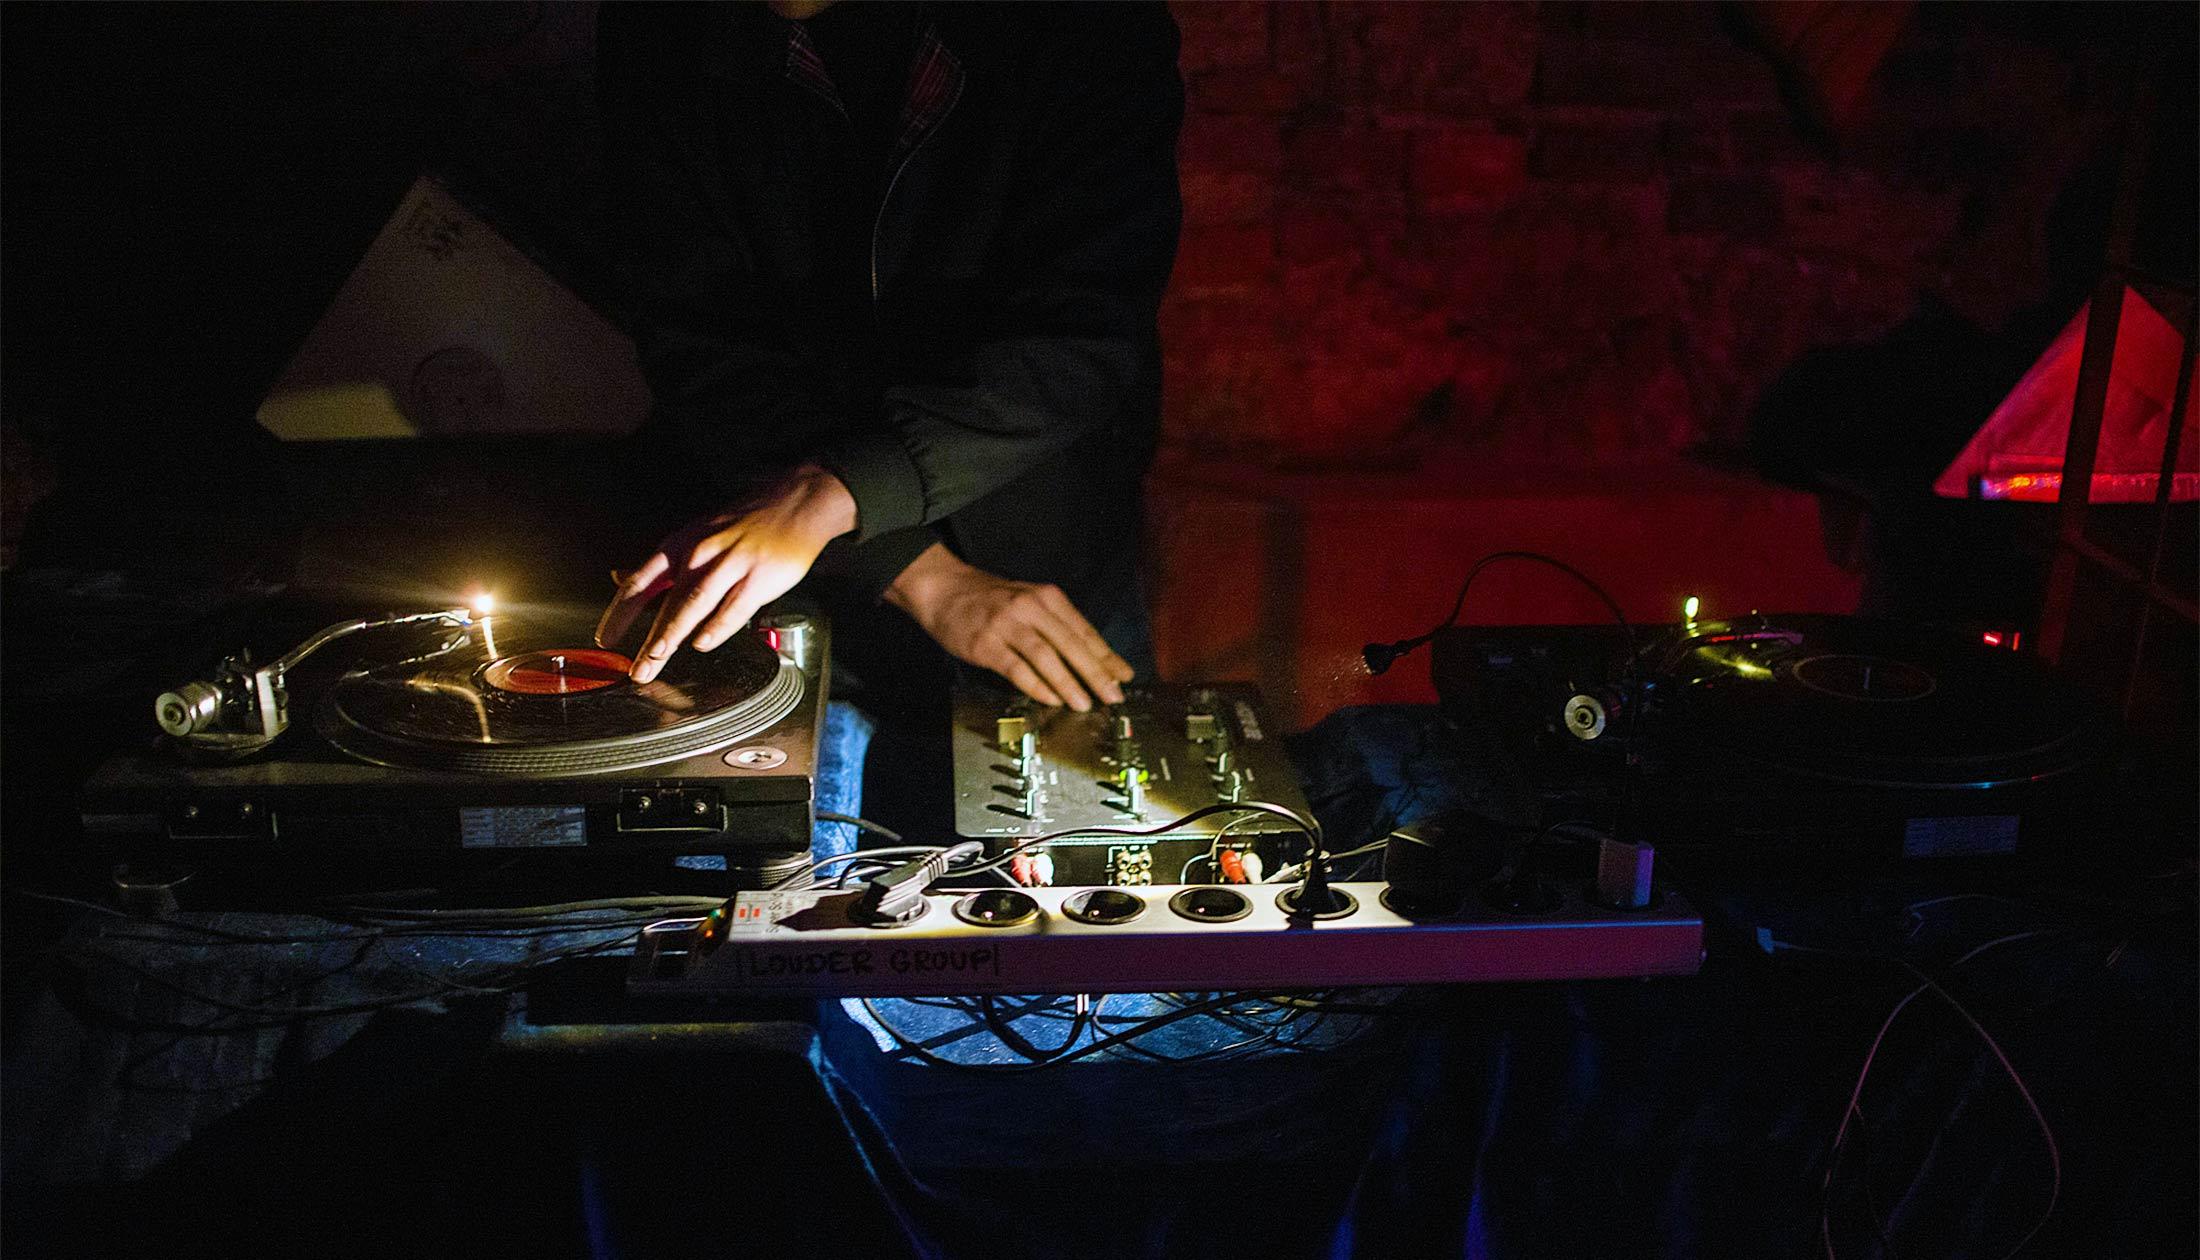 Krakow by Klaudia Zupnik Party Electronic Music Techno Underground Poland